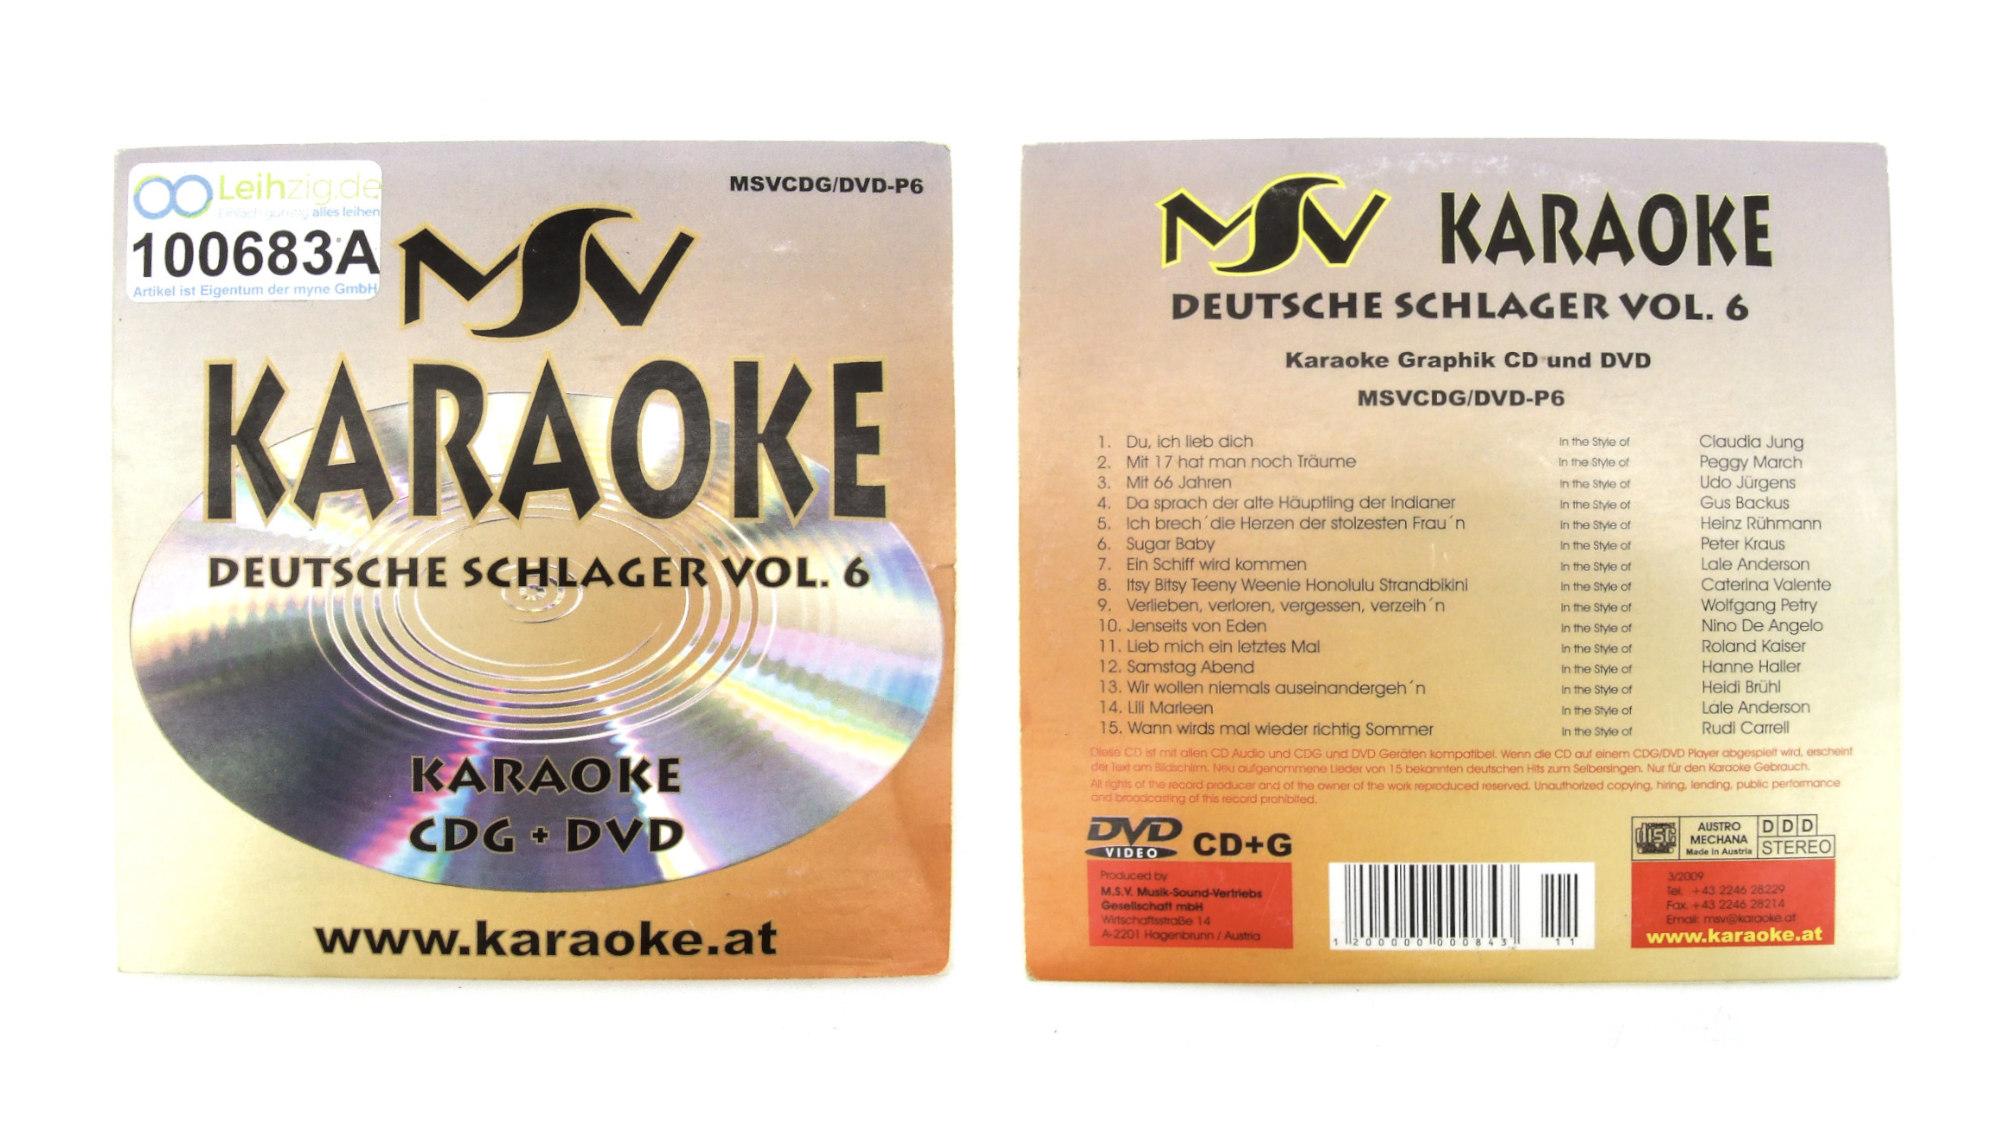 Karaoke CD Schlager Vol. 6 leihen